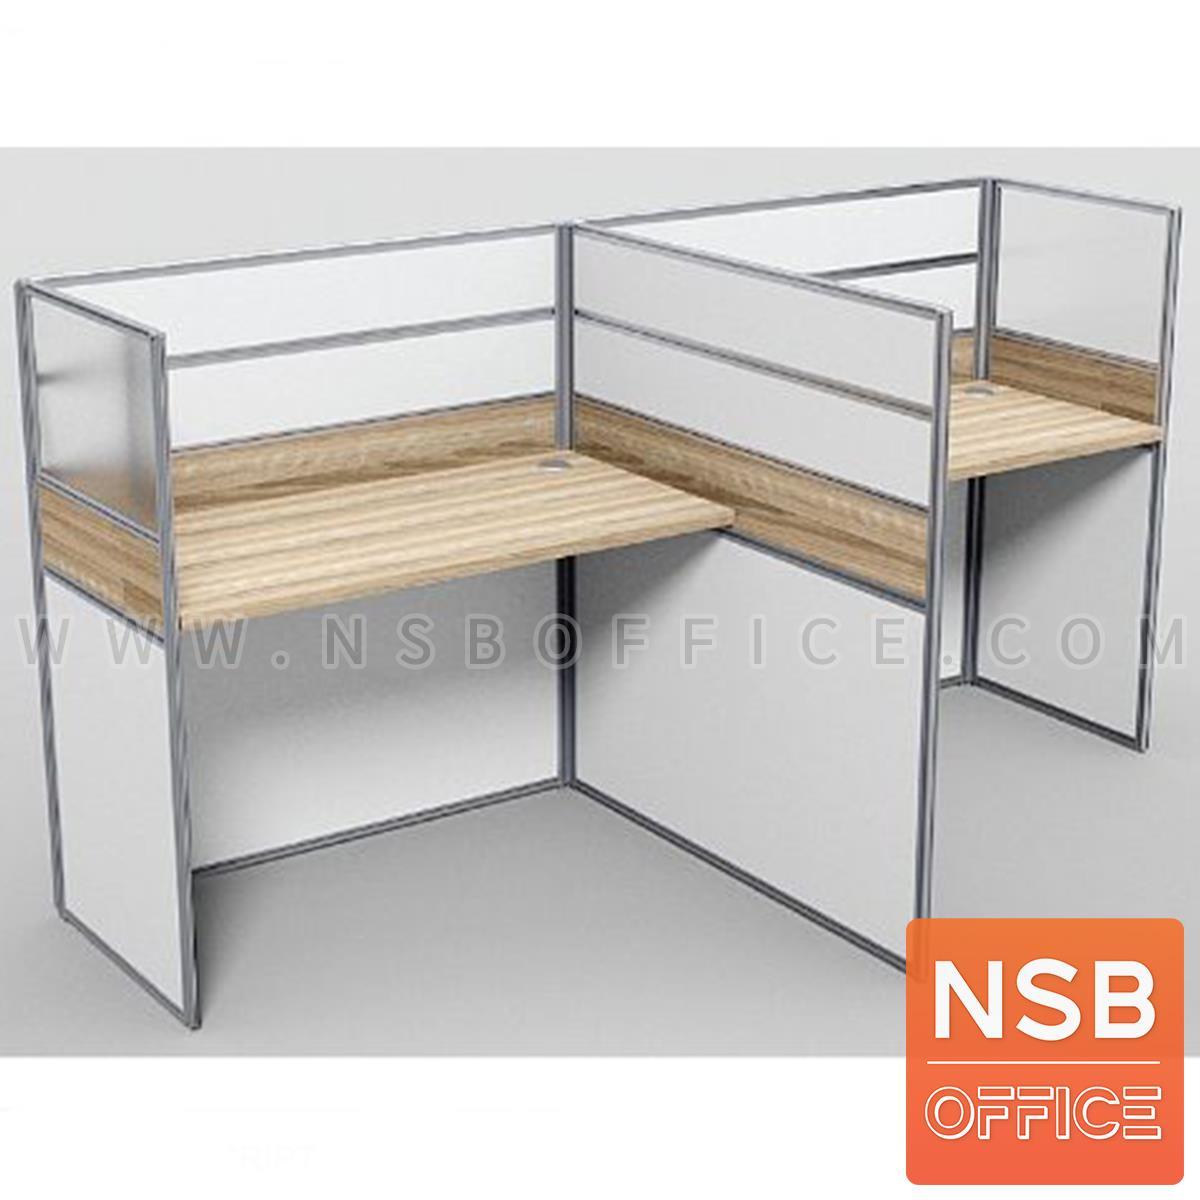 A04A204:โต๊ะทำงานกลุ่ม 2 ที่นั่ง รุุ่น Barcadi 22  ขนาด 306W*122D*120H cm.